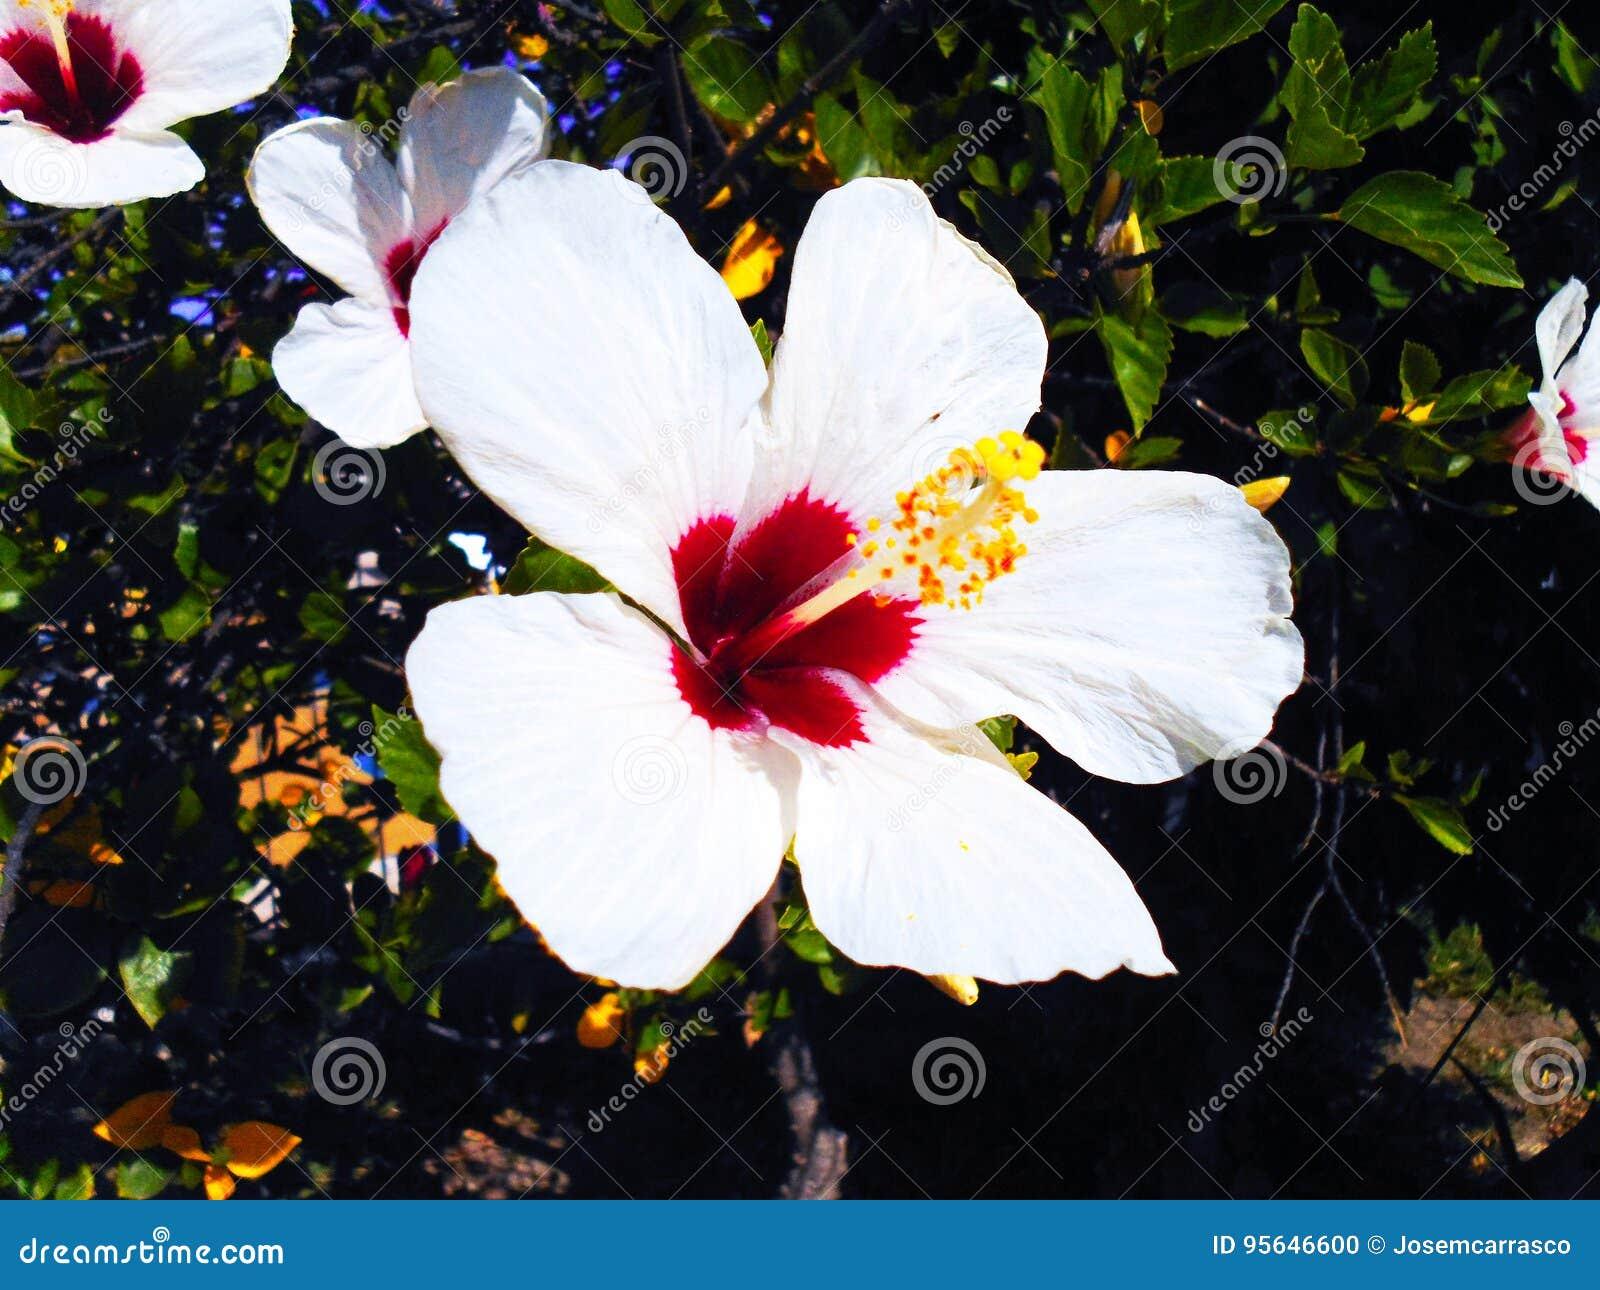 Flower called hibiscus stock photo image of family color 95646600 plant with white flower called hibiscus mightylinksfo